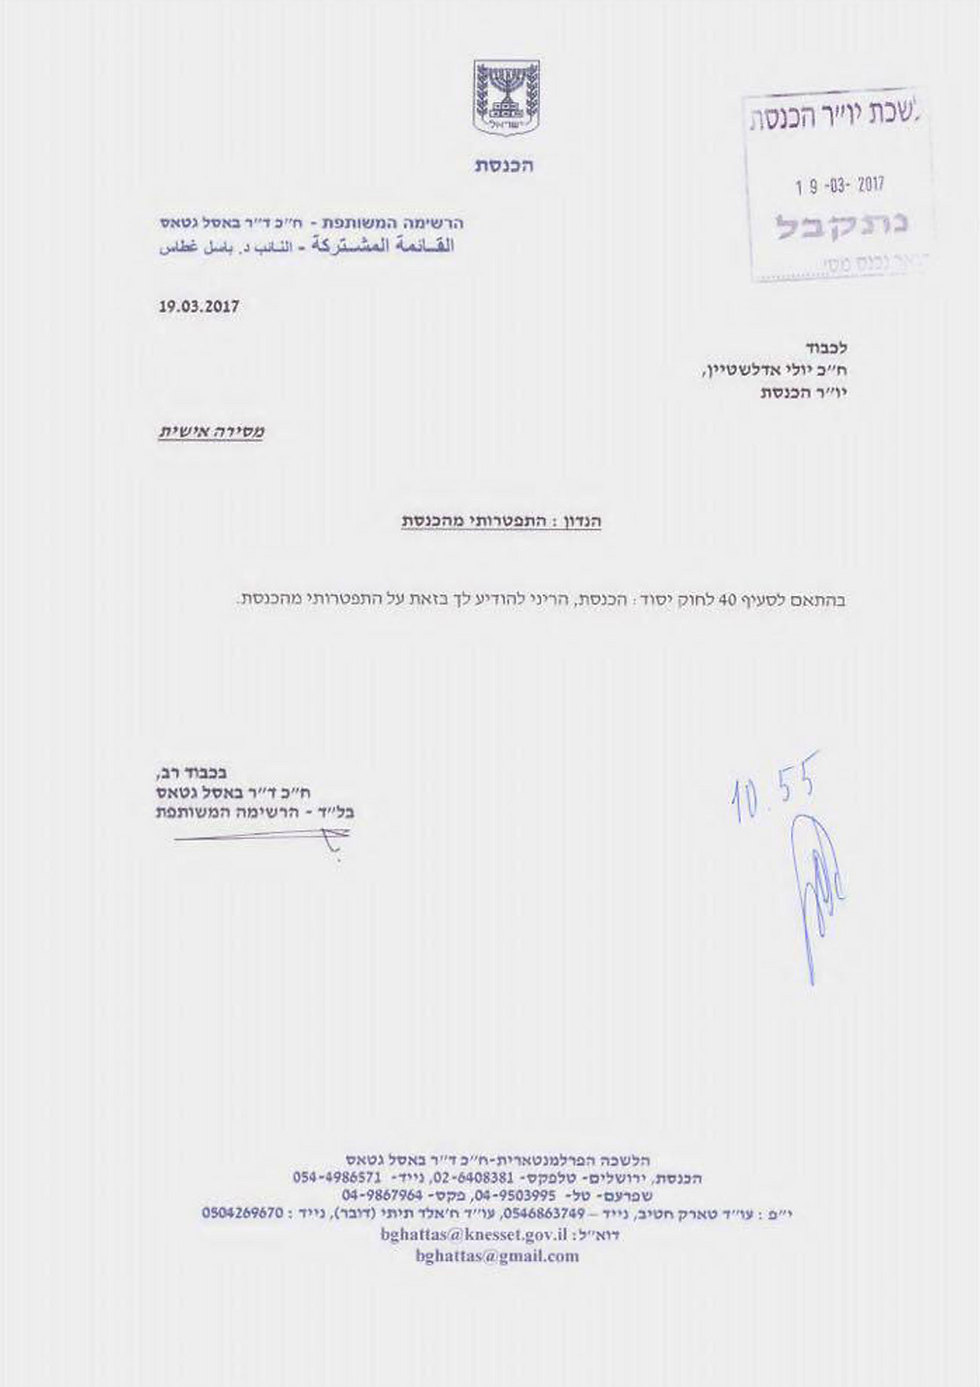 Copy of Ghattas' resignation notice